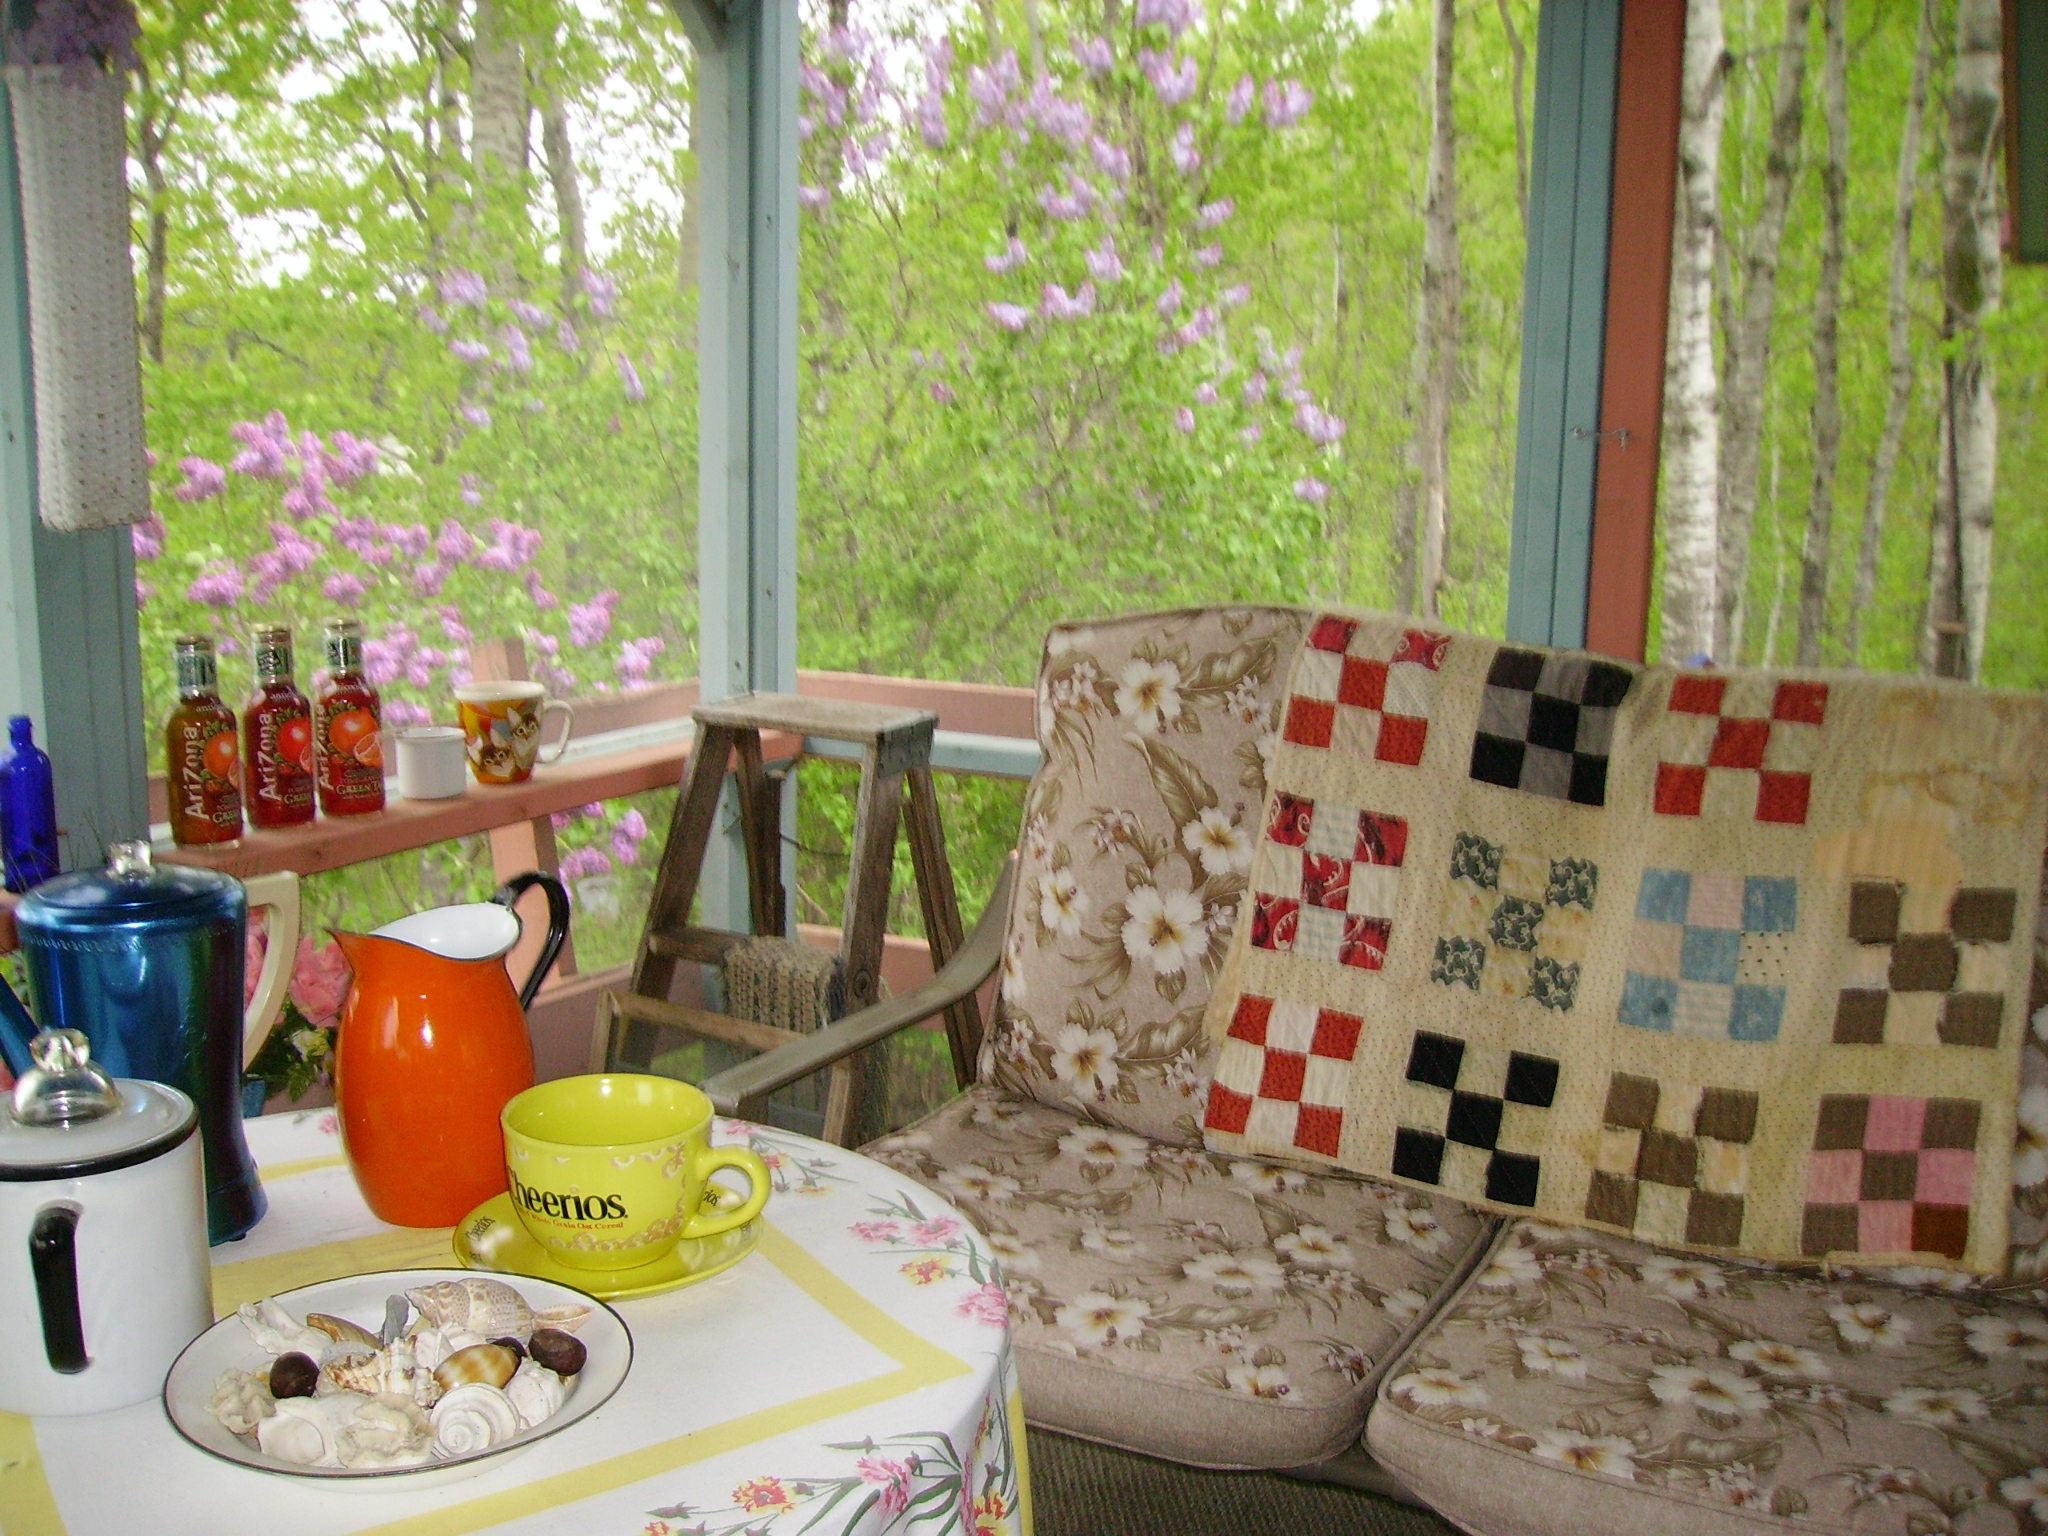 Retreat Center with Grandma's Quilt